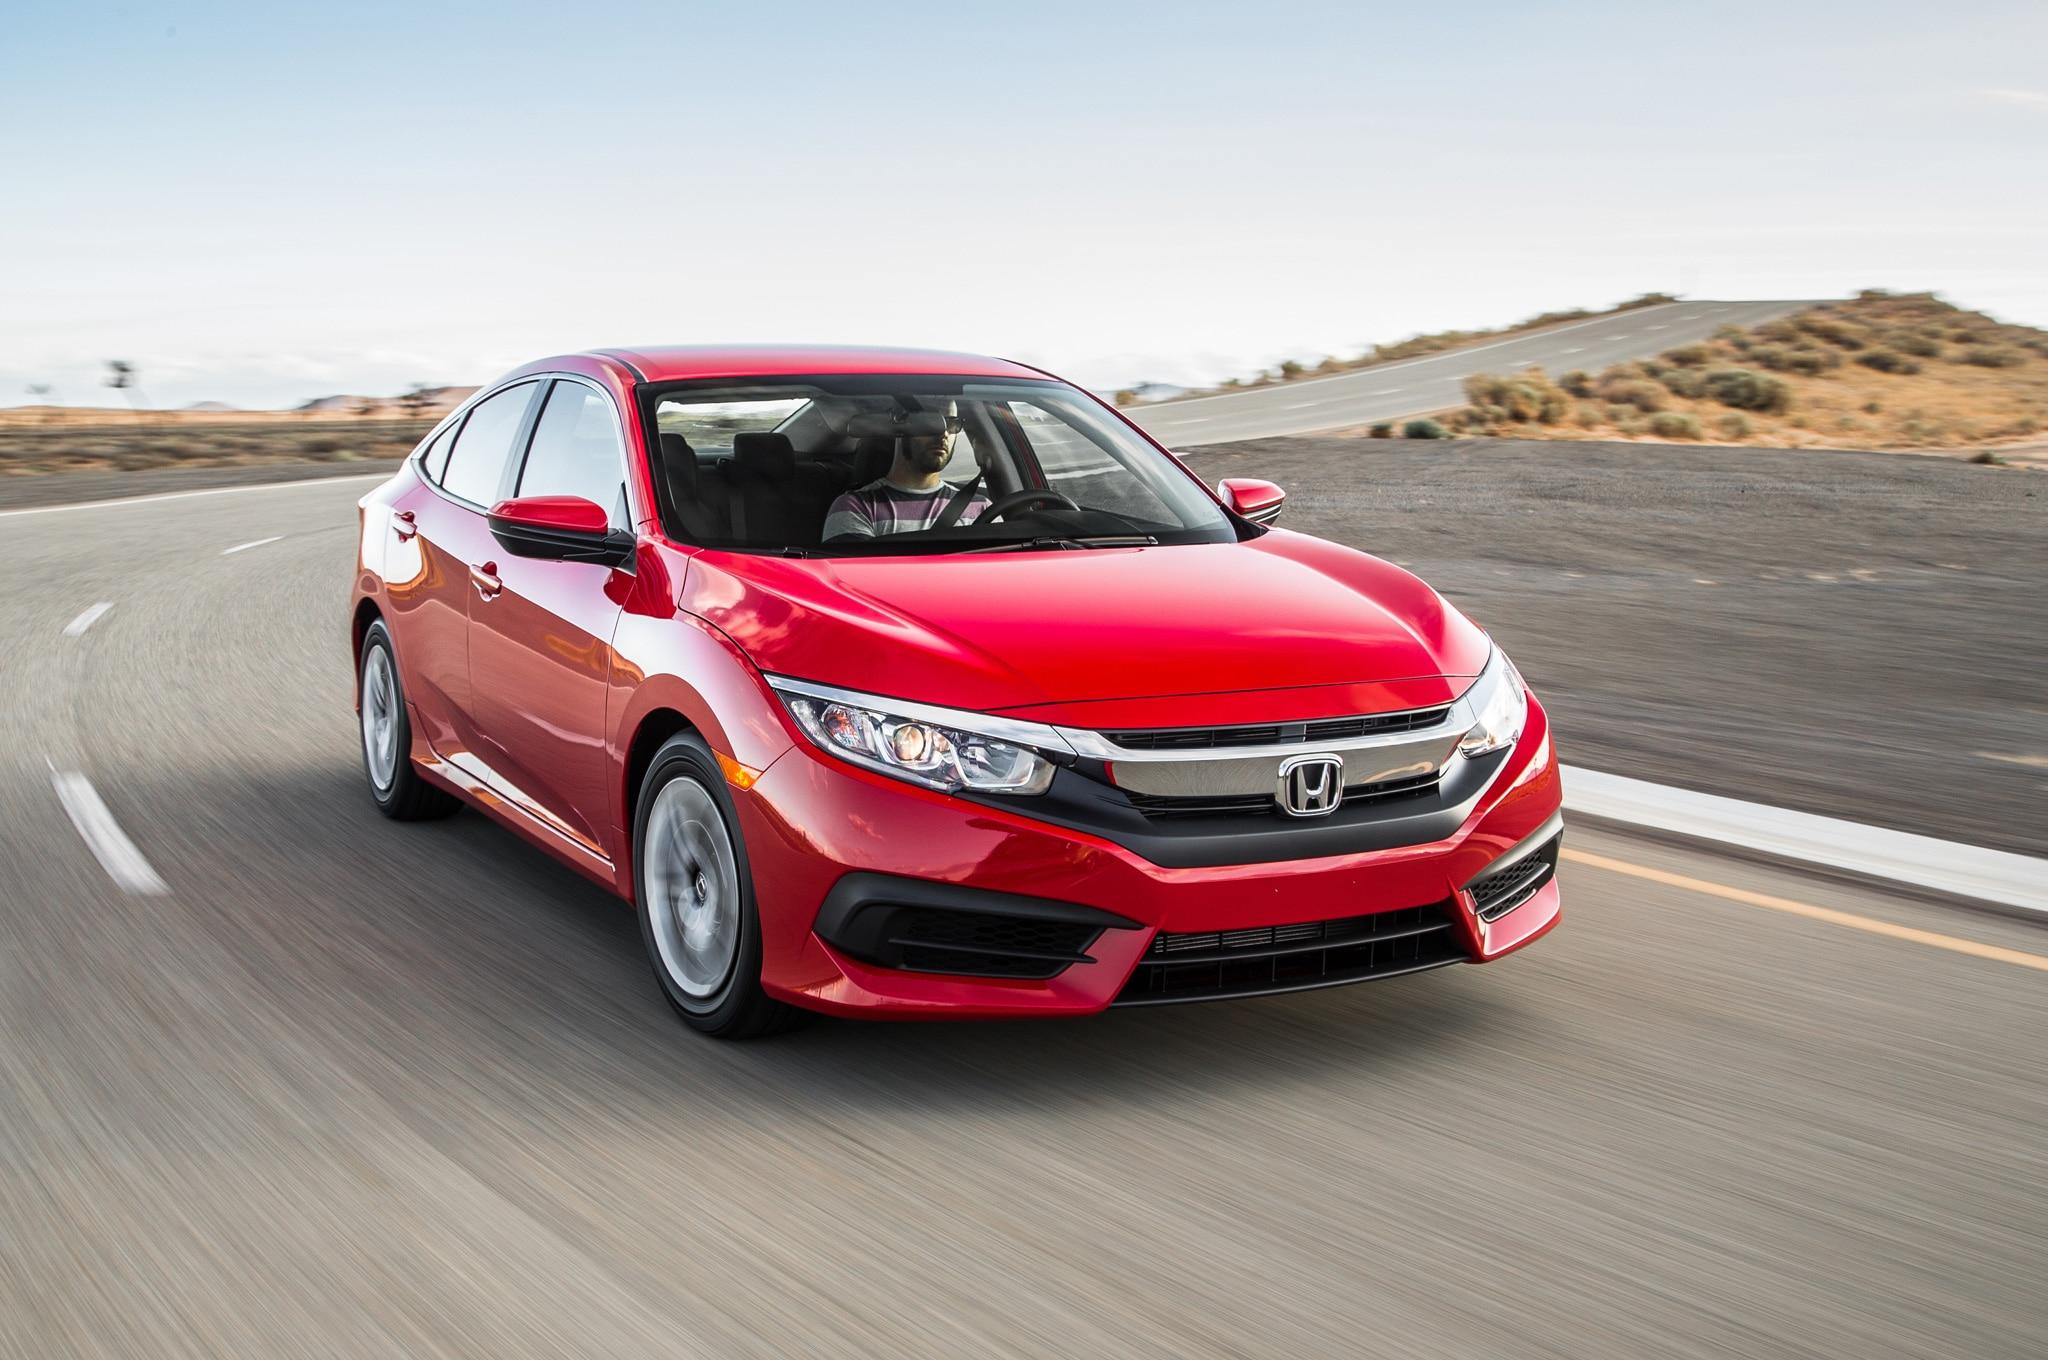 2016 Honda Civic Sedan Front Three Quarter In Motion 02